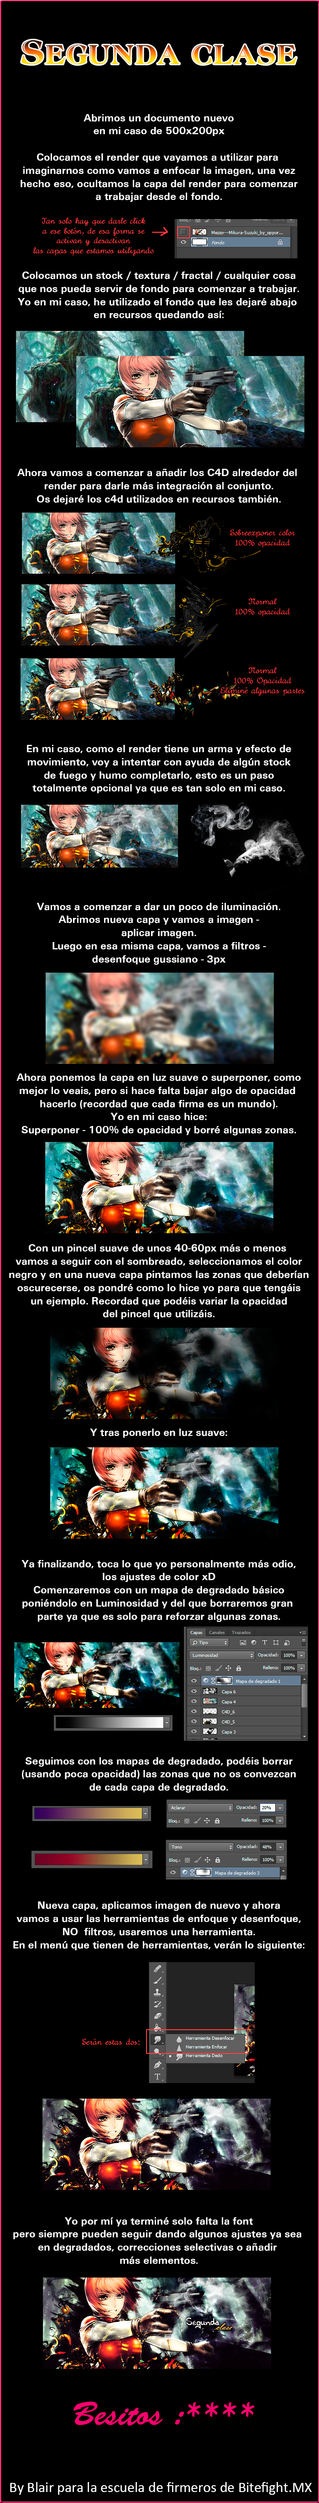 Tuto Segunda Clase BiteMX by BlairLena